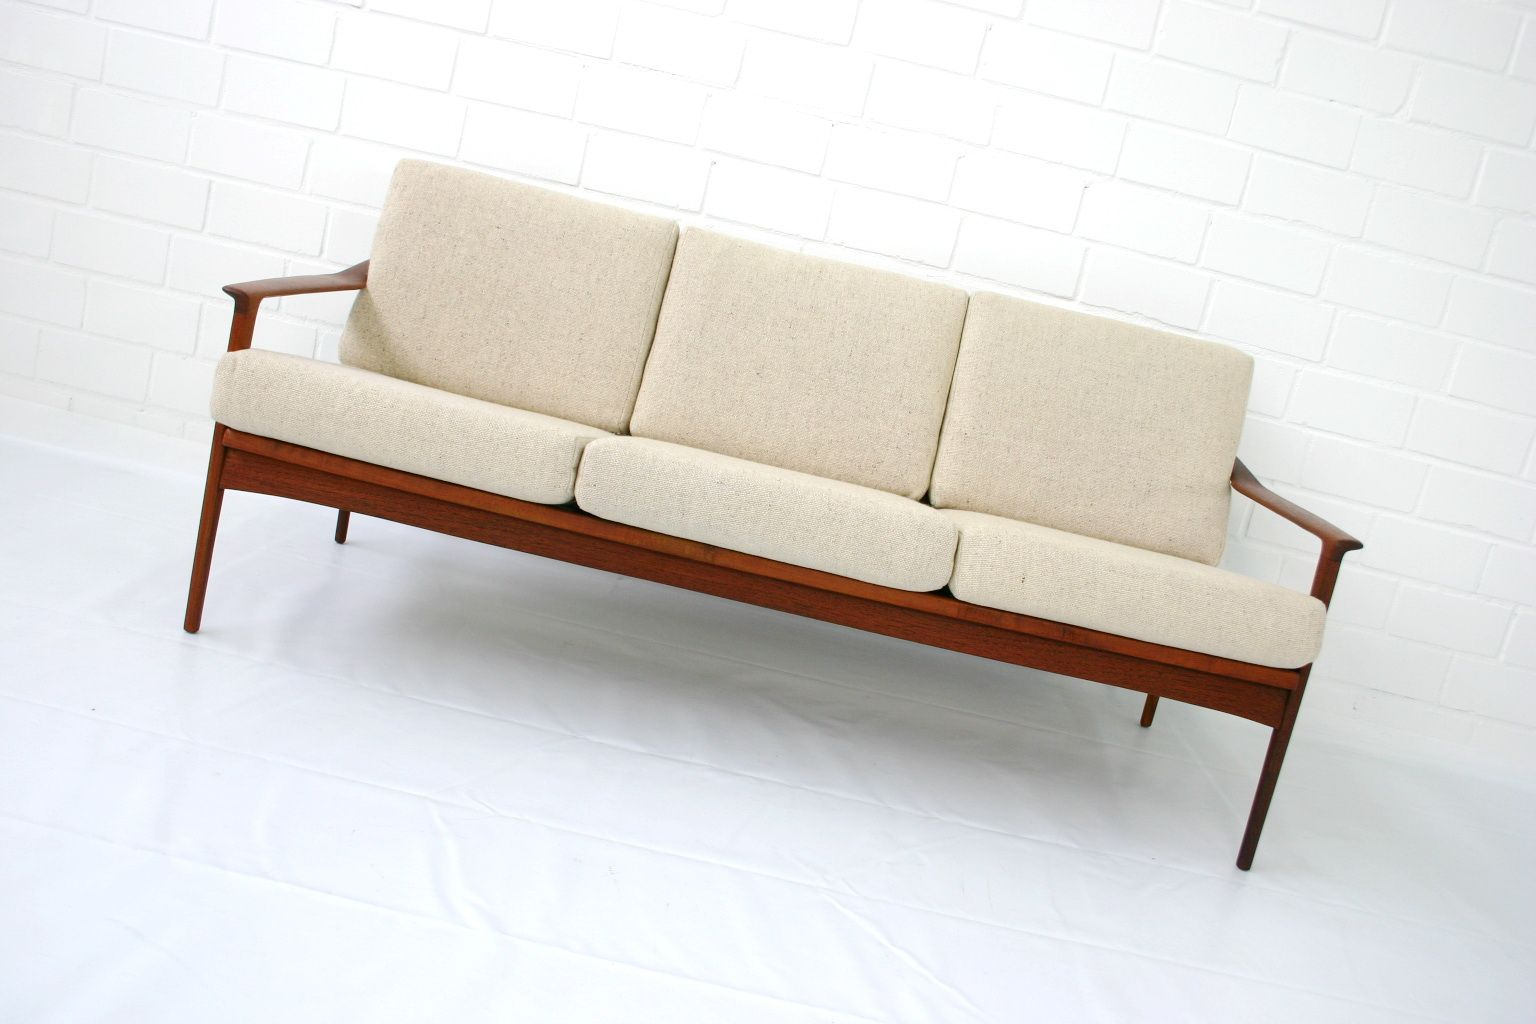 canap mid century en teck par ib kofod larsen pour selig. Black Bedroom Furniture Sets. Home Design Ideas